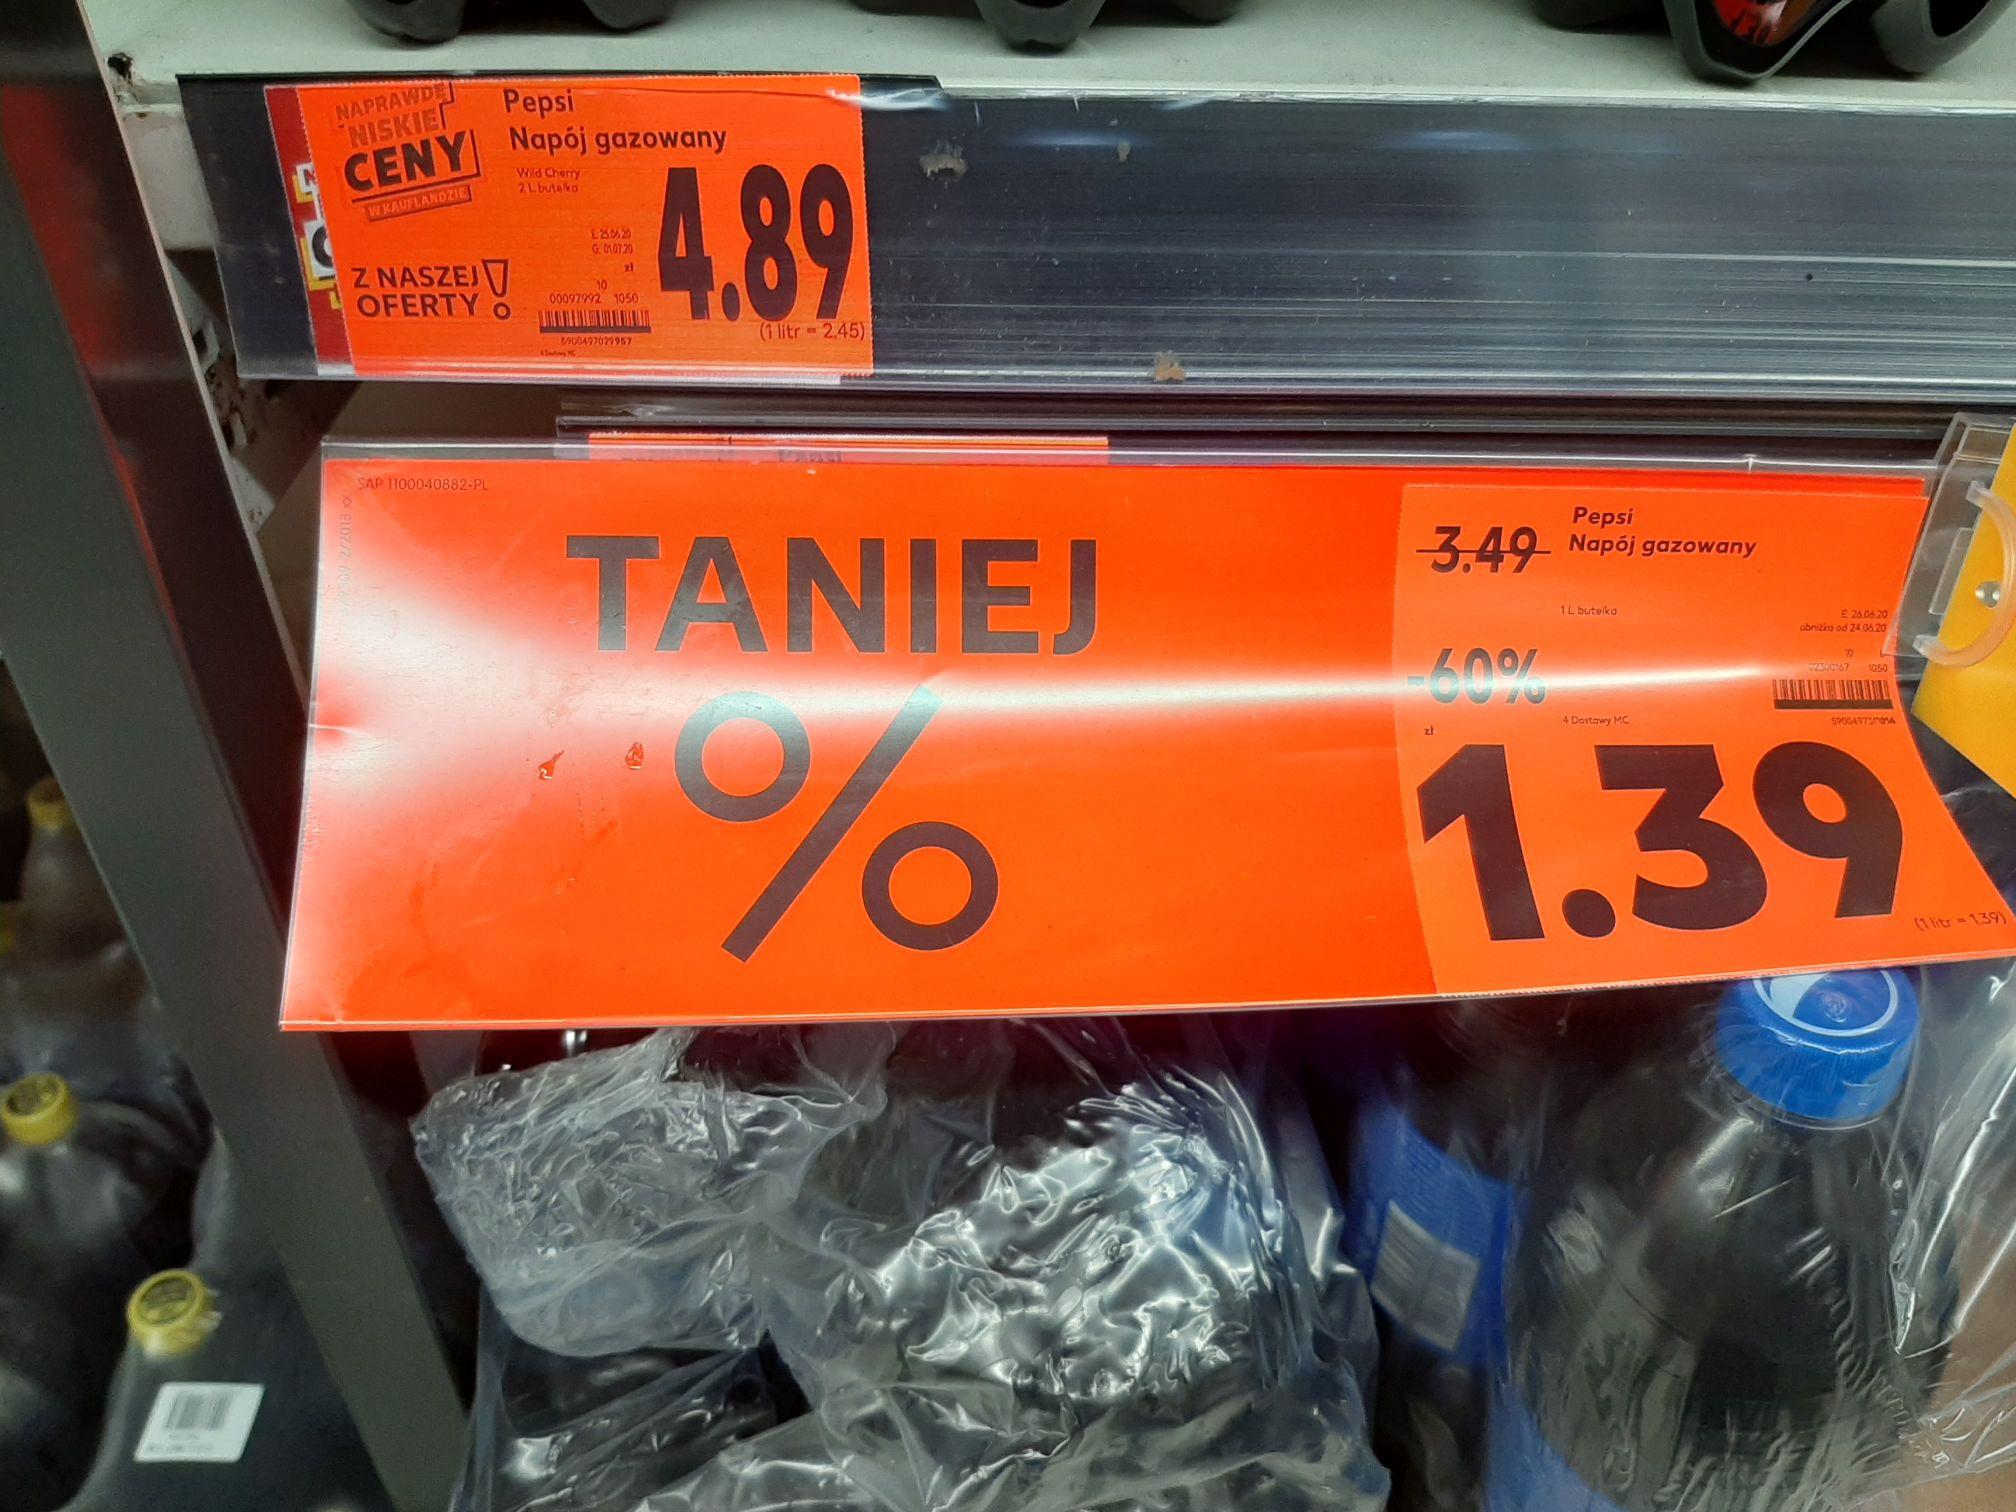 Litrowa pepsi za 1,39 zł